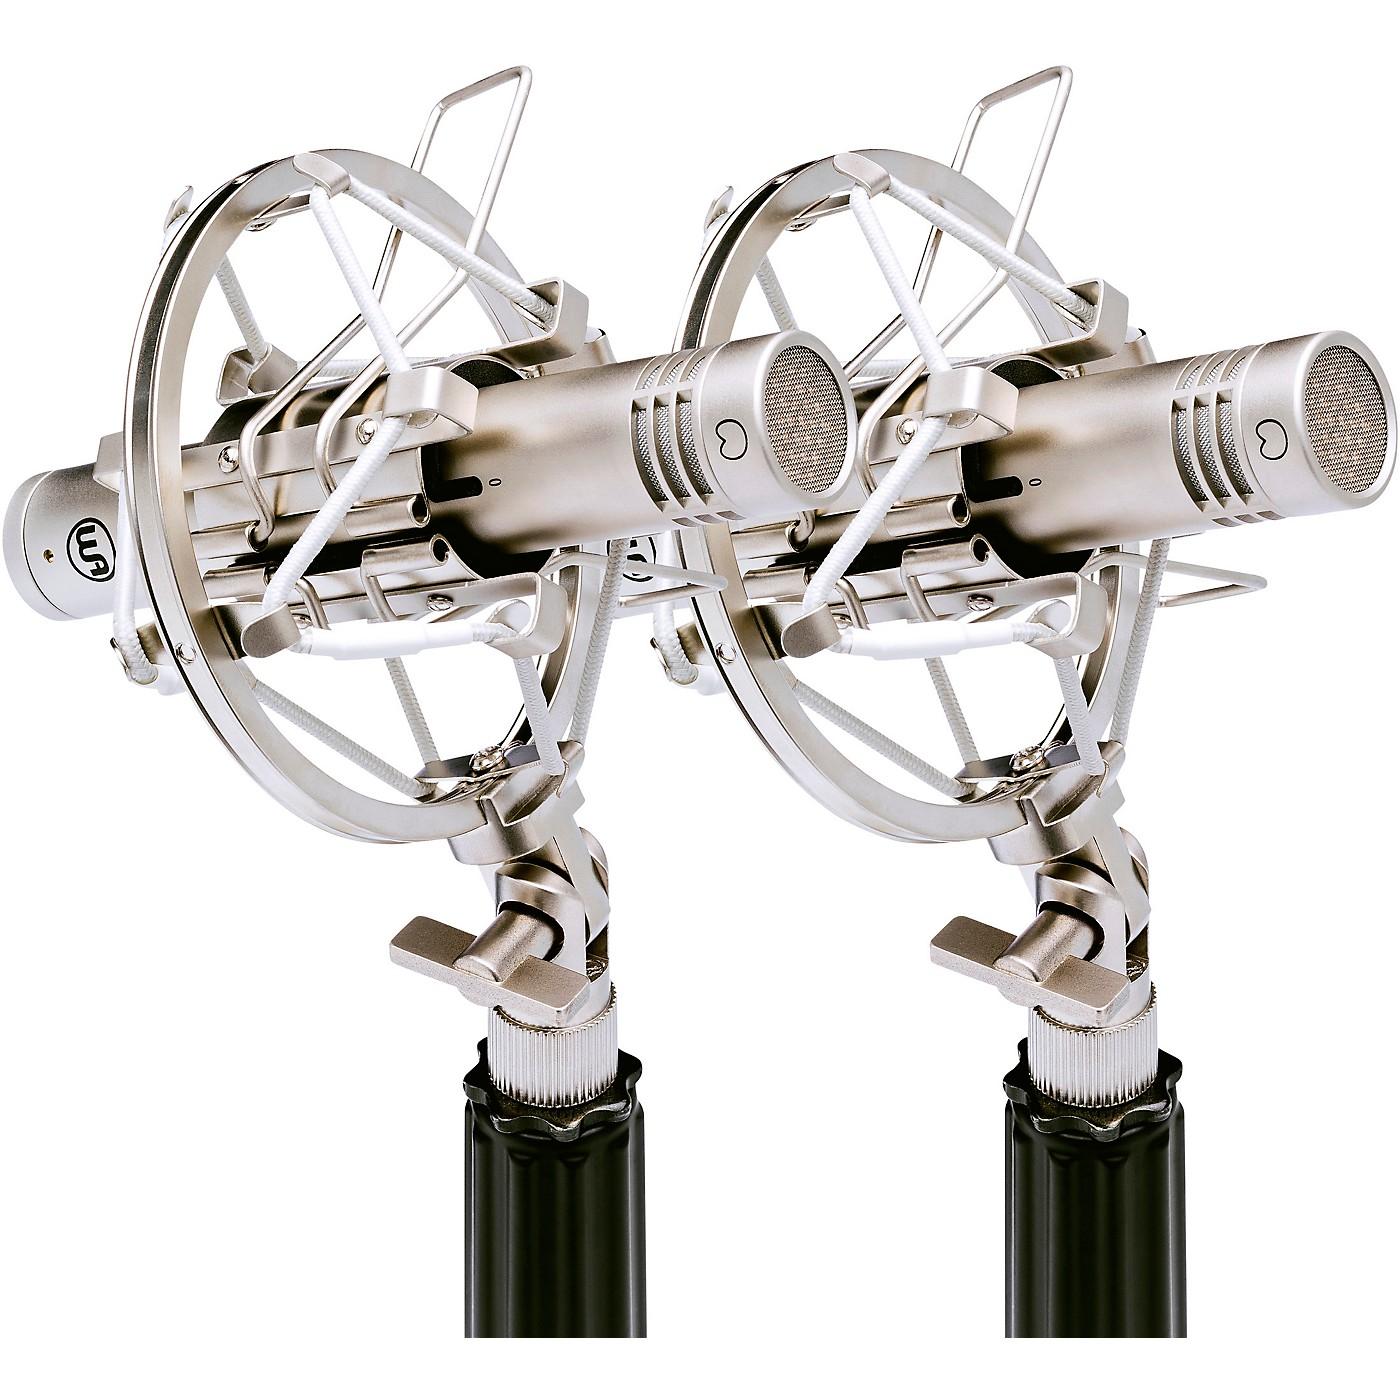 Warm Audio WA-84 Small Diaphragm Condenser Microphone Stereo Pair thumbnail